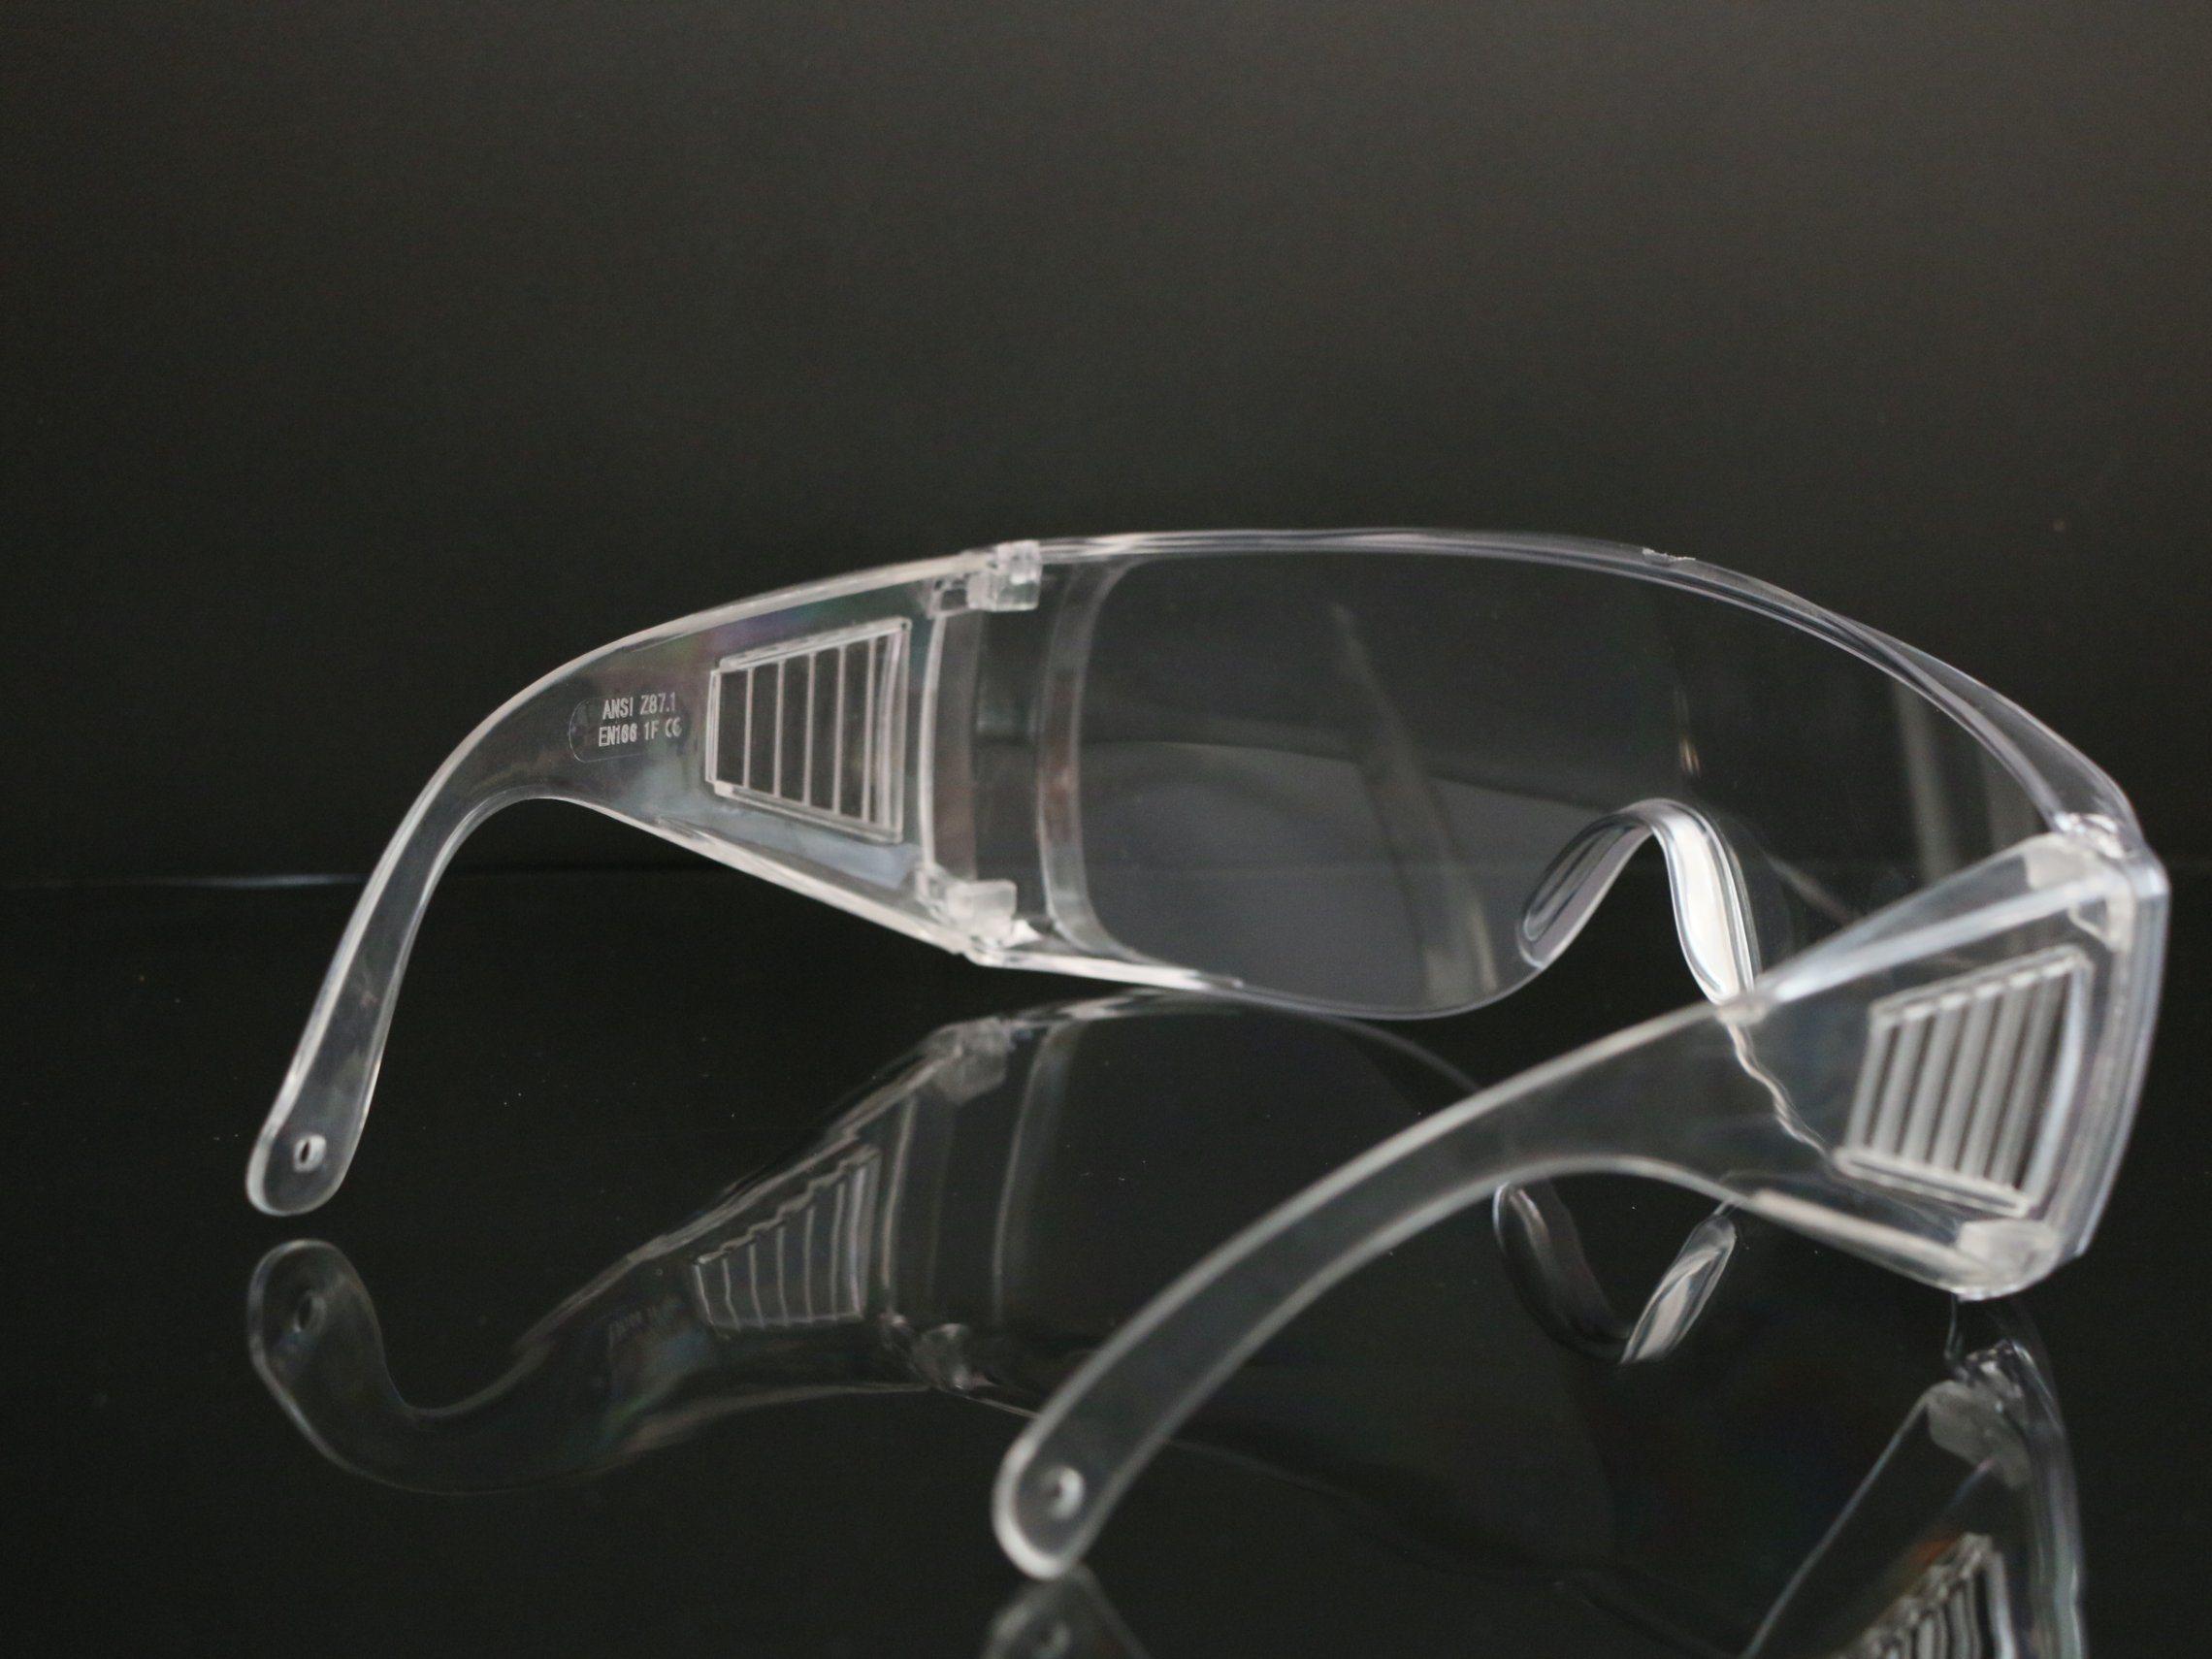 Heldere veiligheidsbril Splash & schokbestendig Goggle Sand Eye Bescherming veiligheidsbril